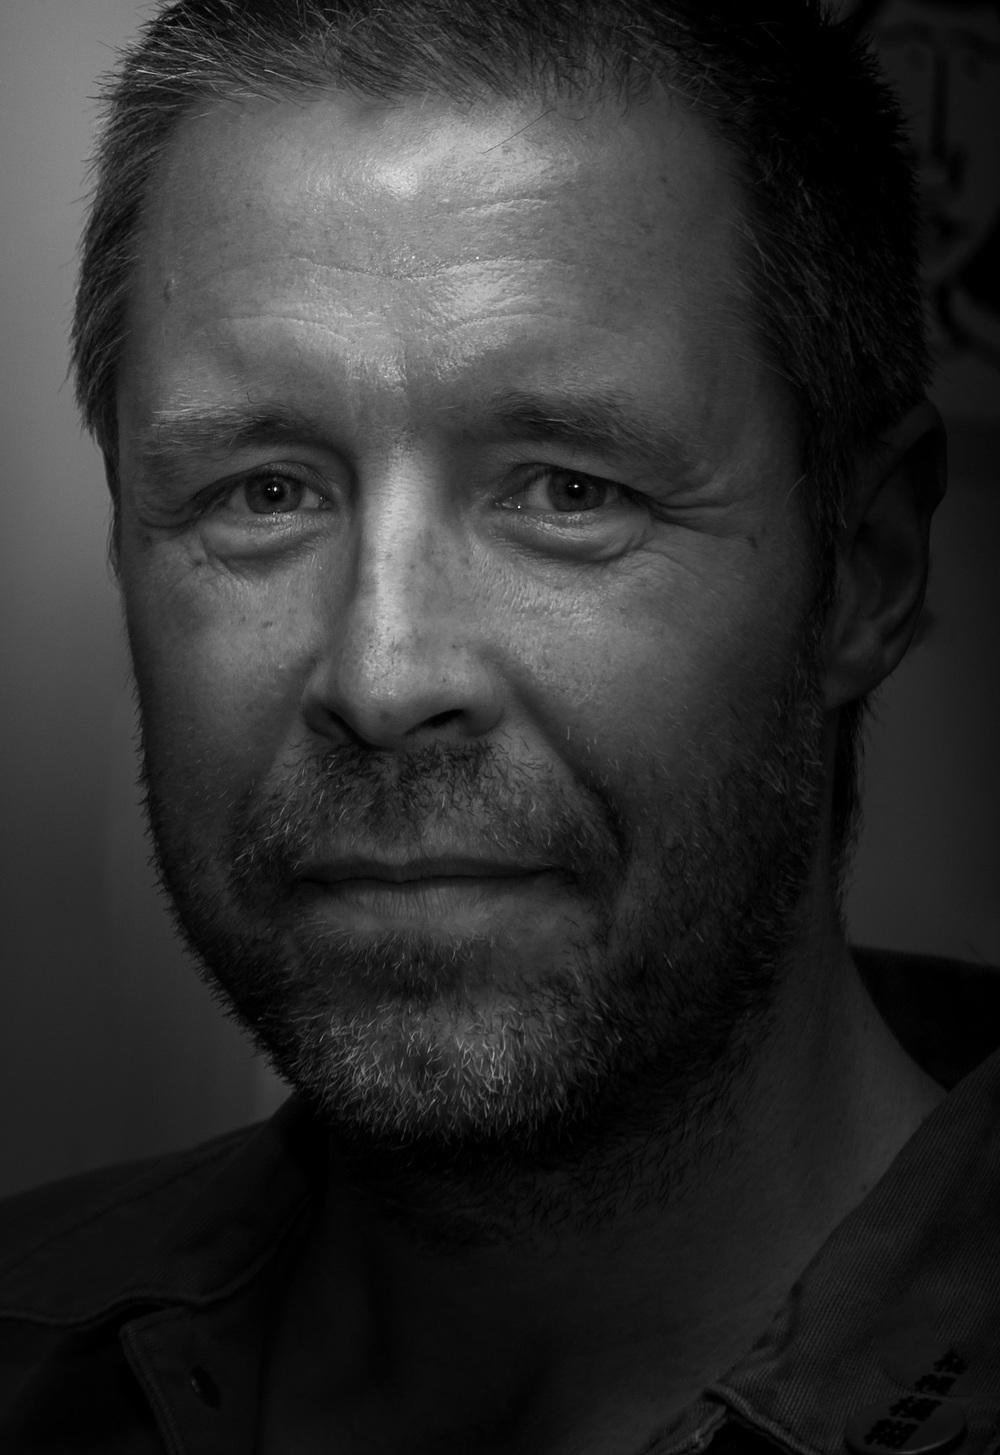 Actor, Paddy considine